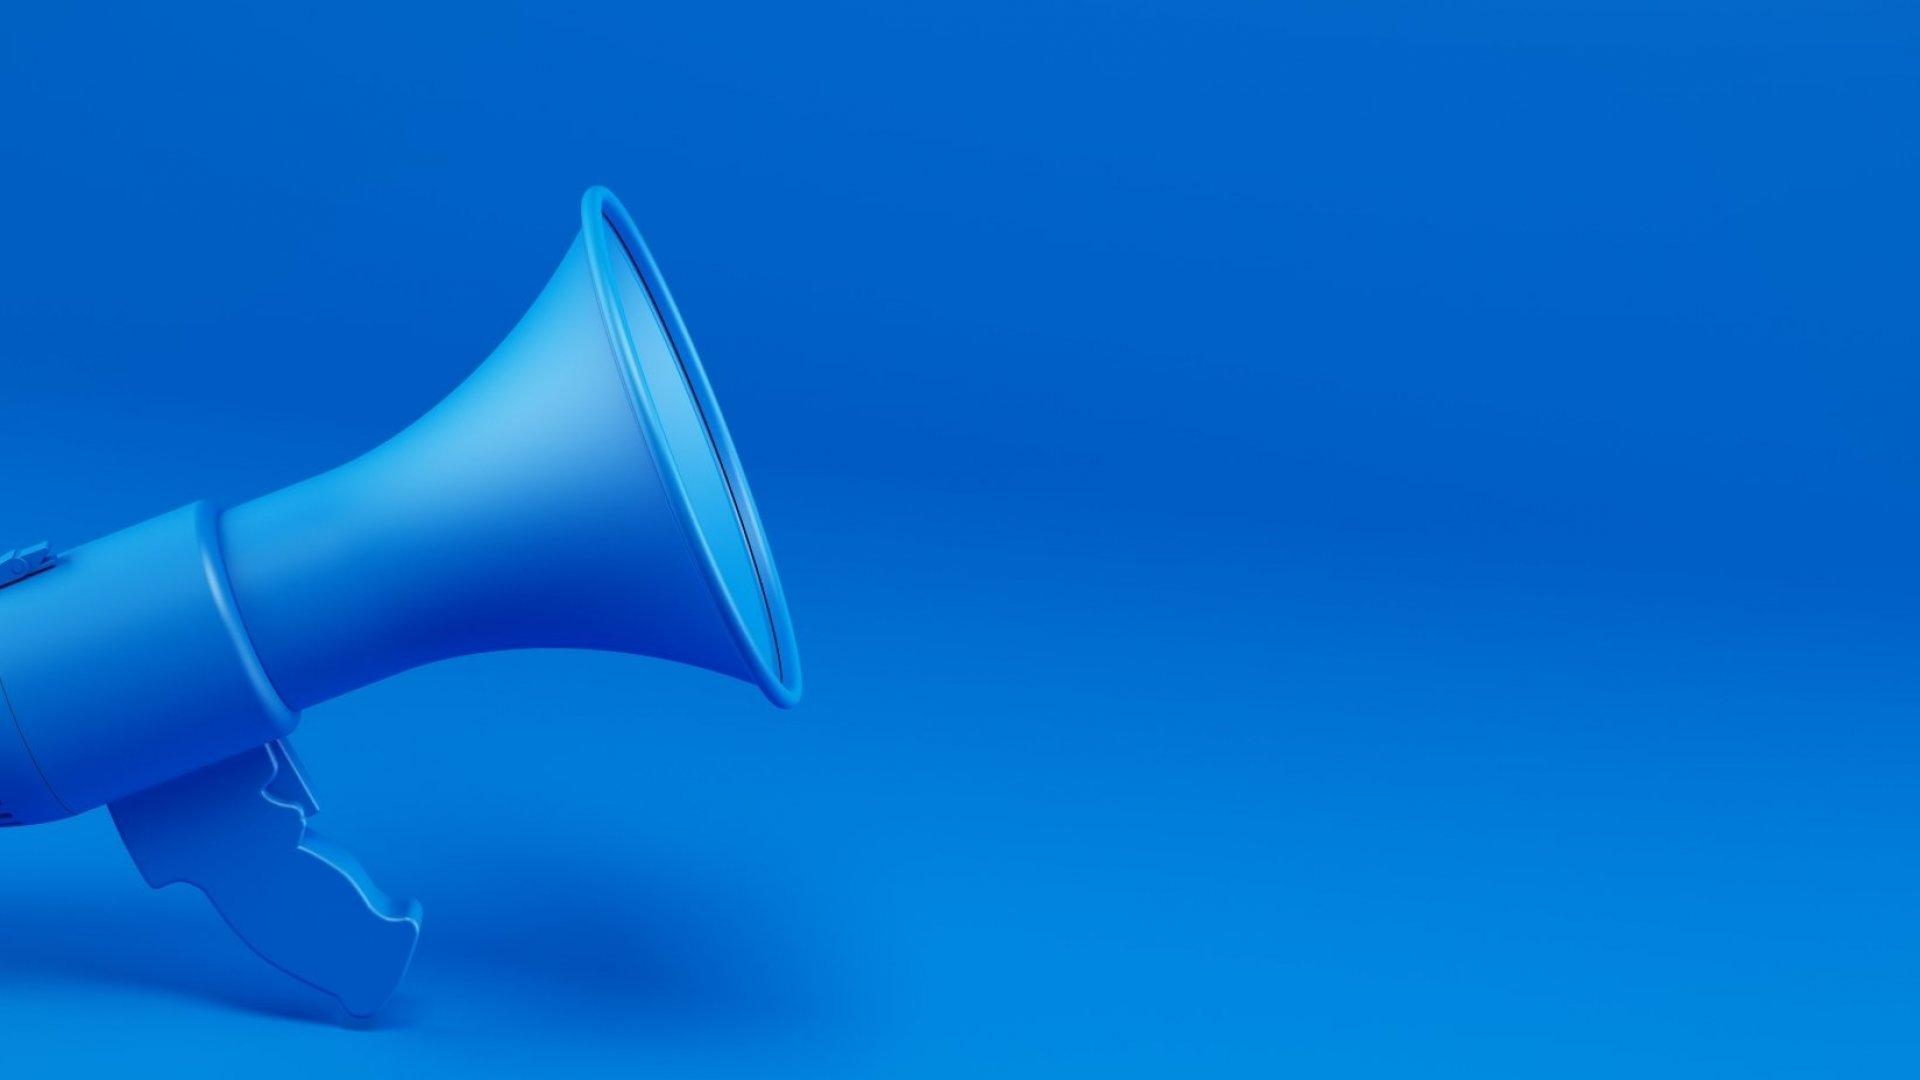 3 Ways to Help Your Brand Achieve 'Verb' Status